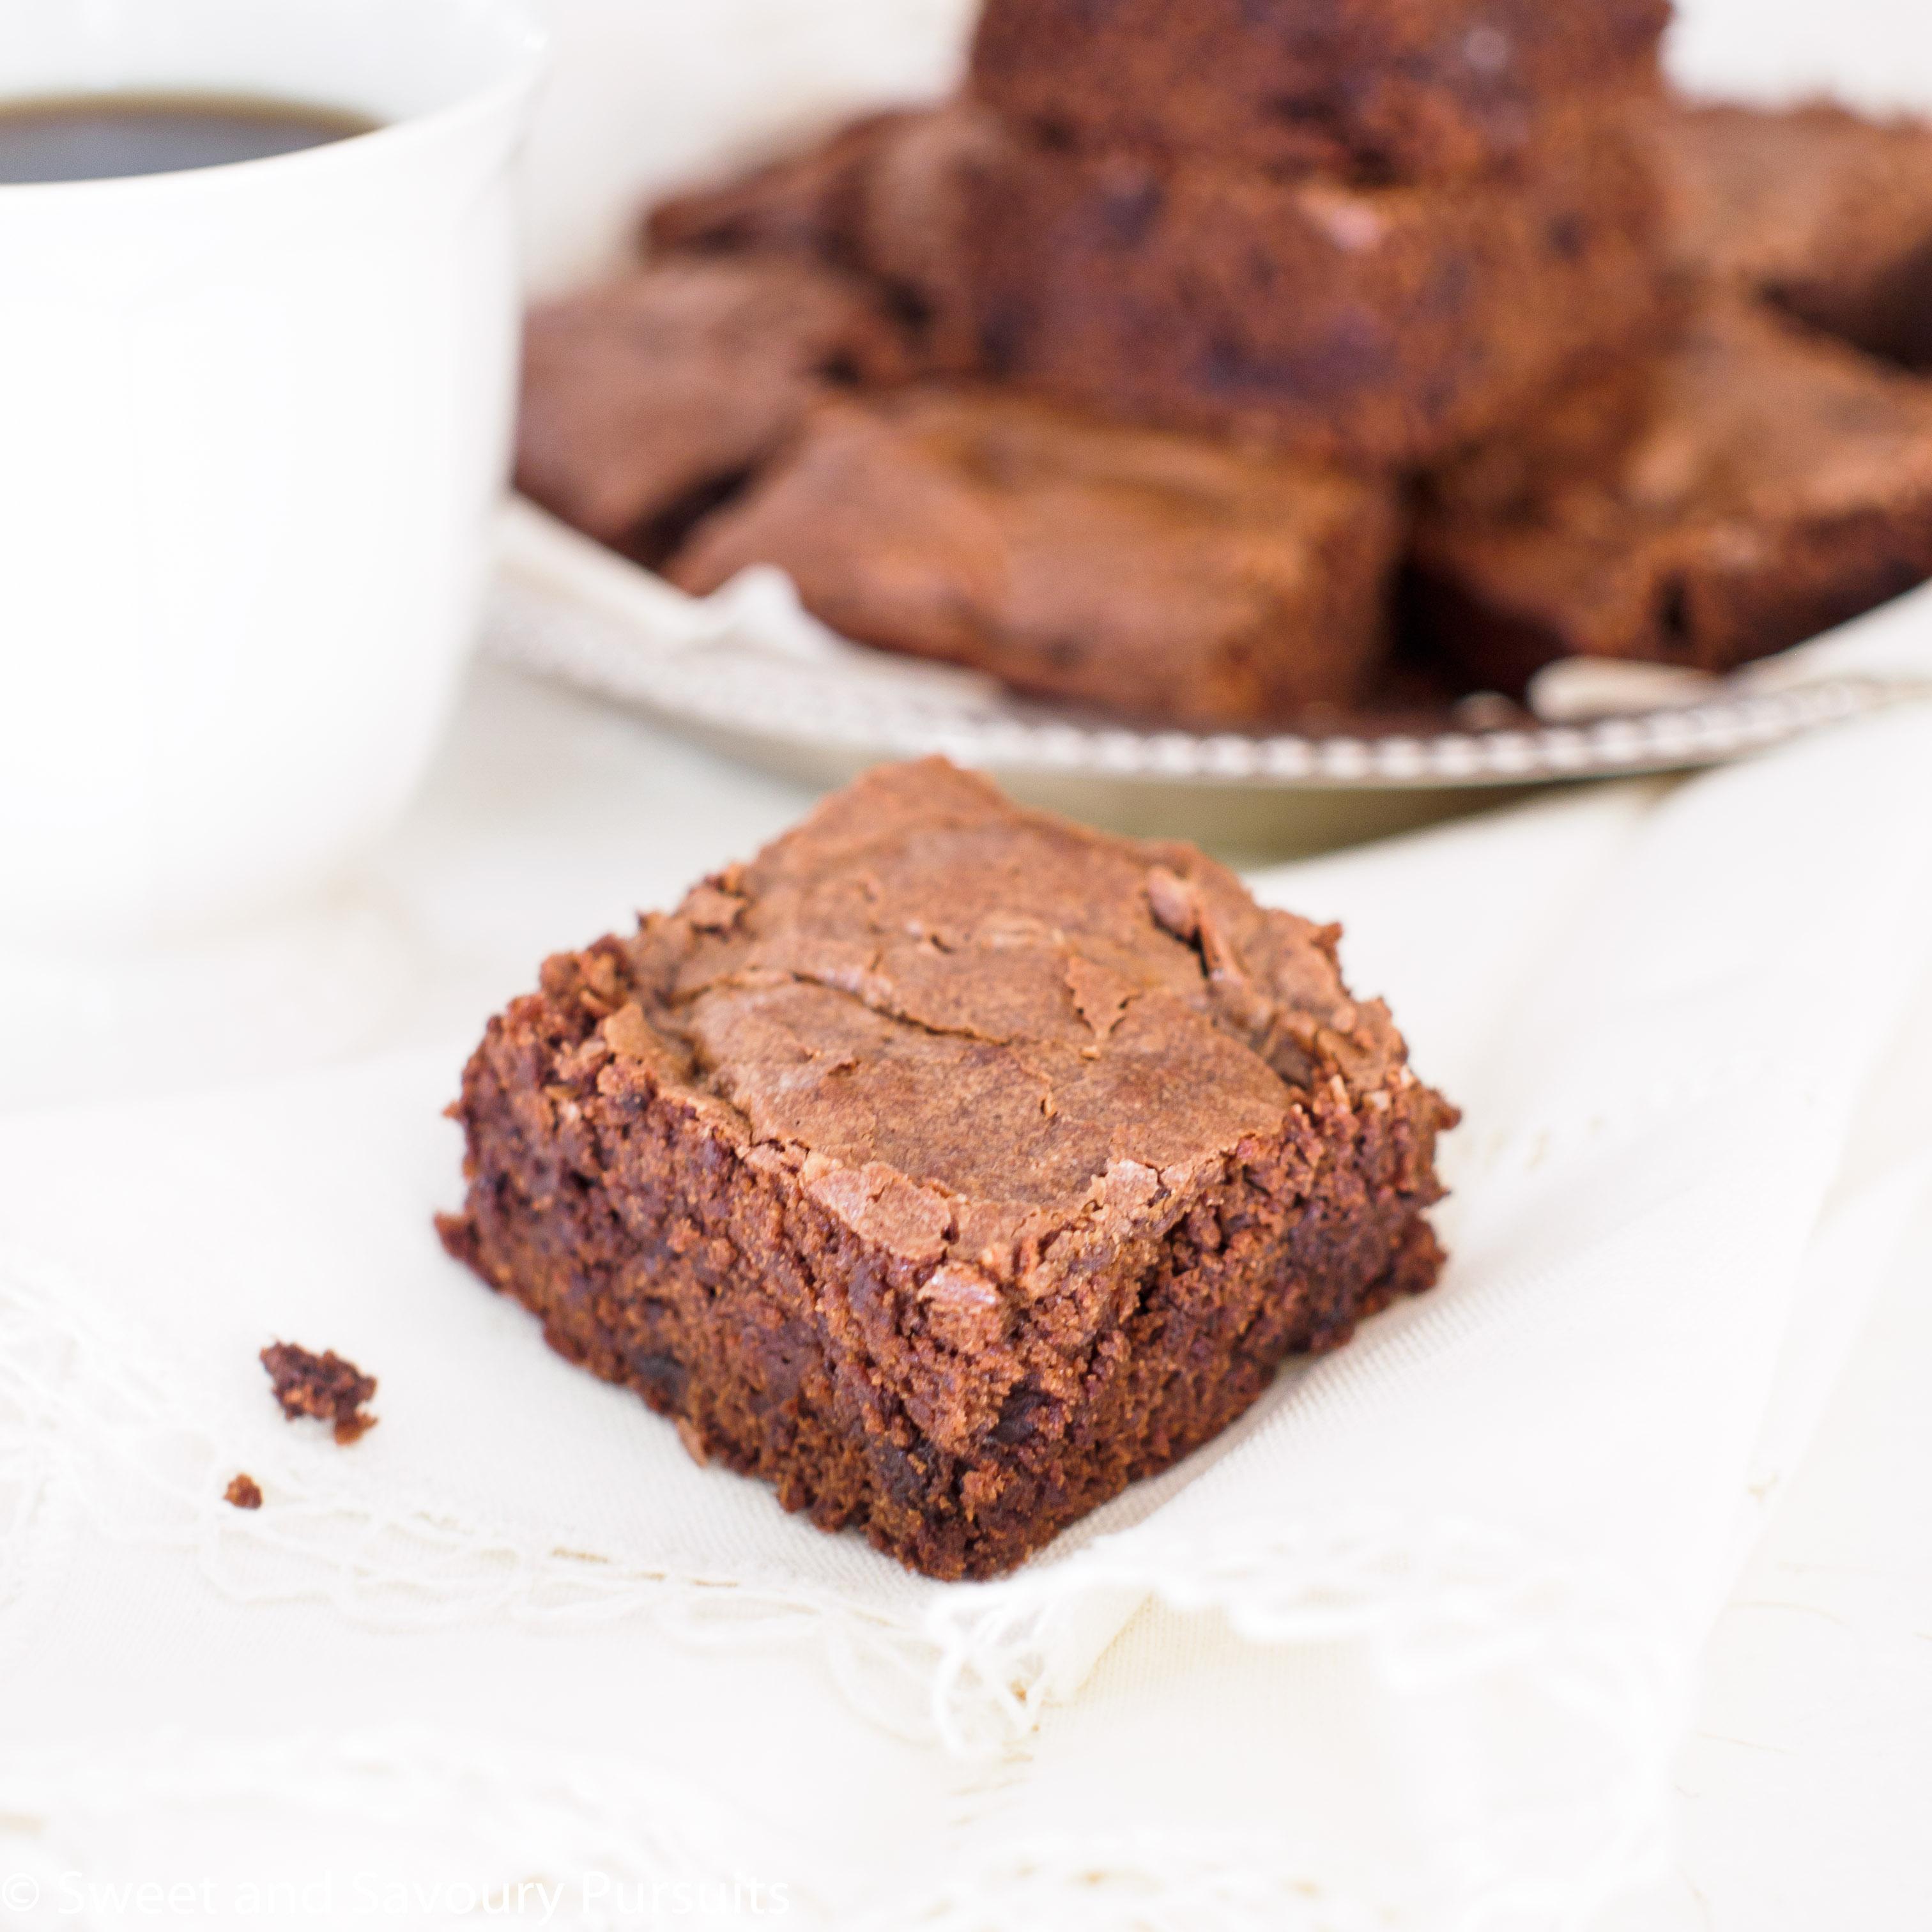 Brownies on dish.